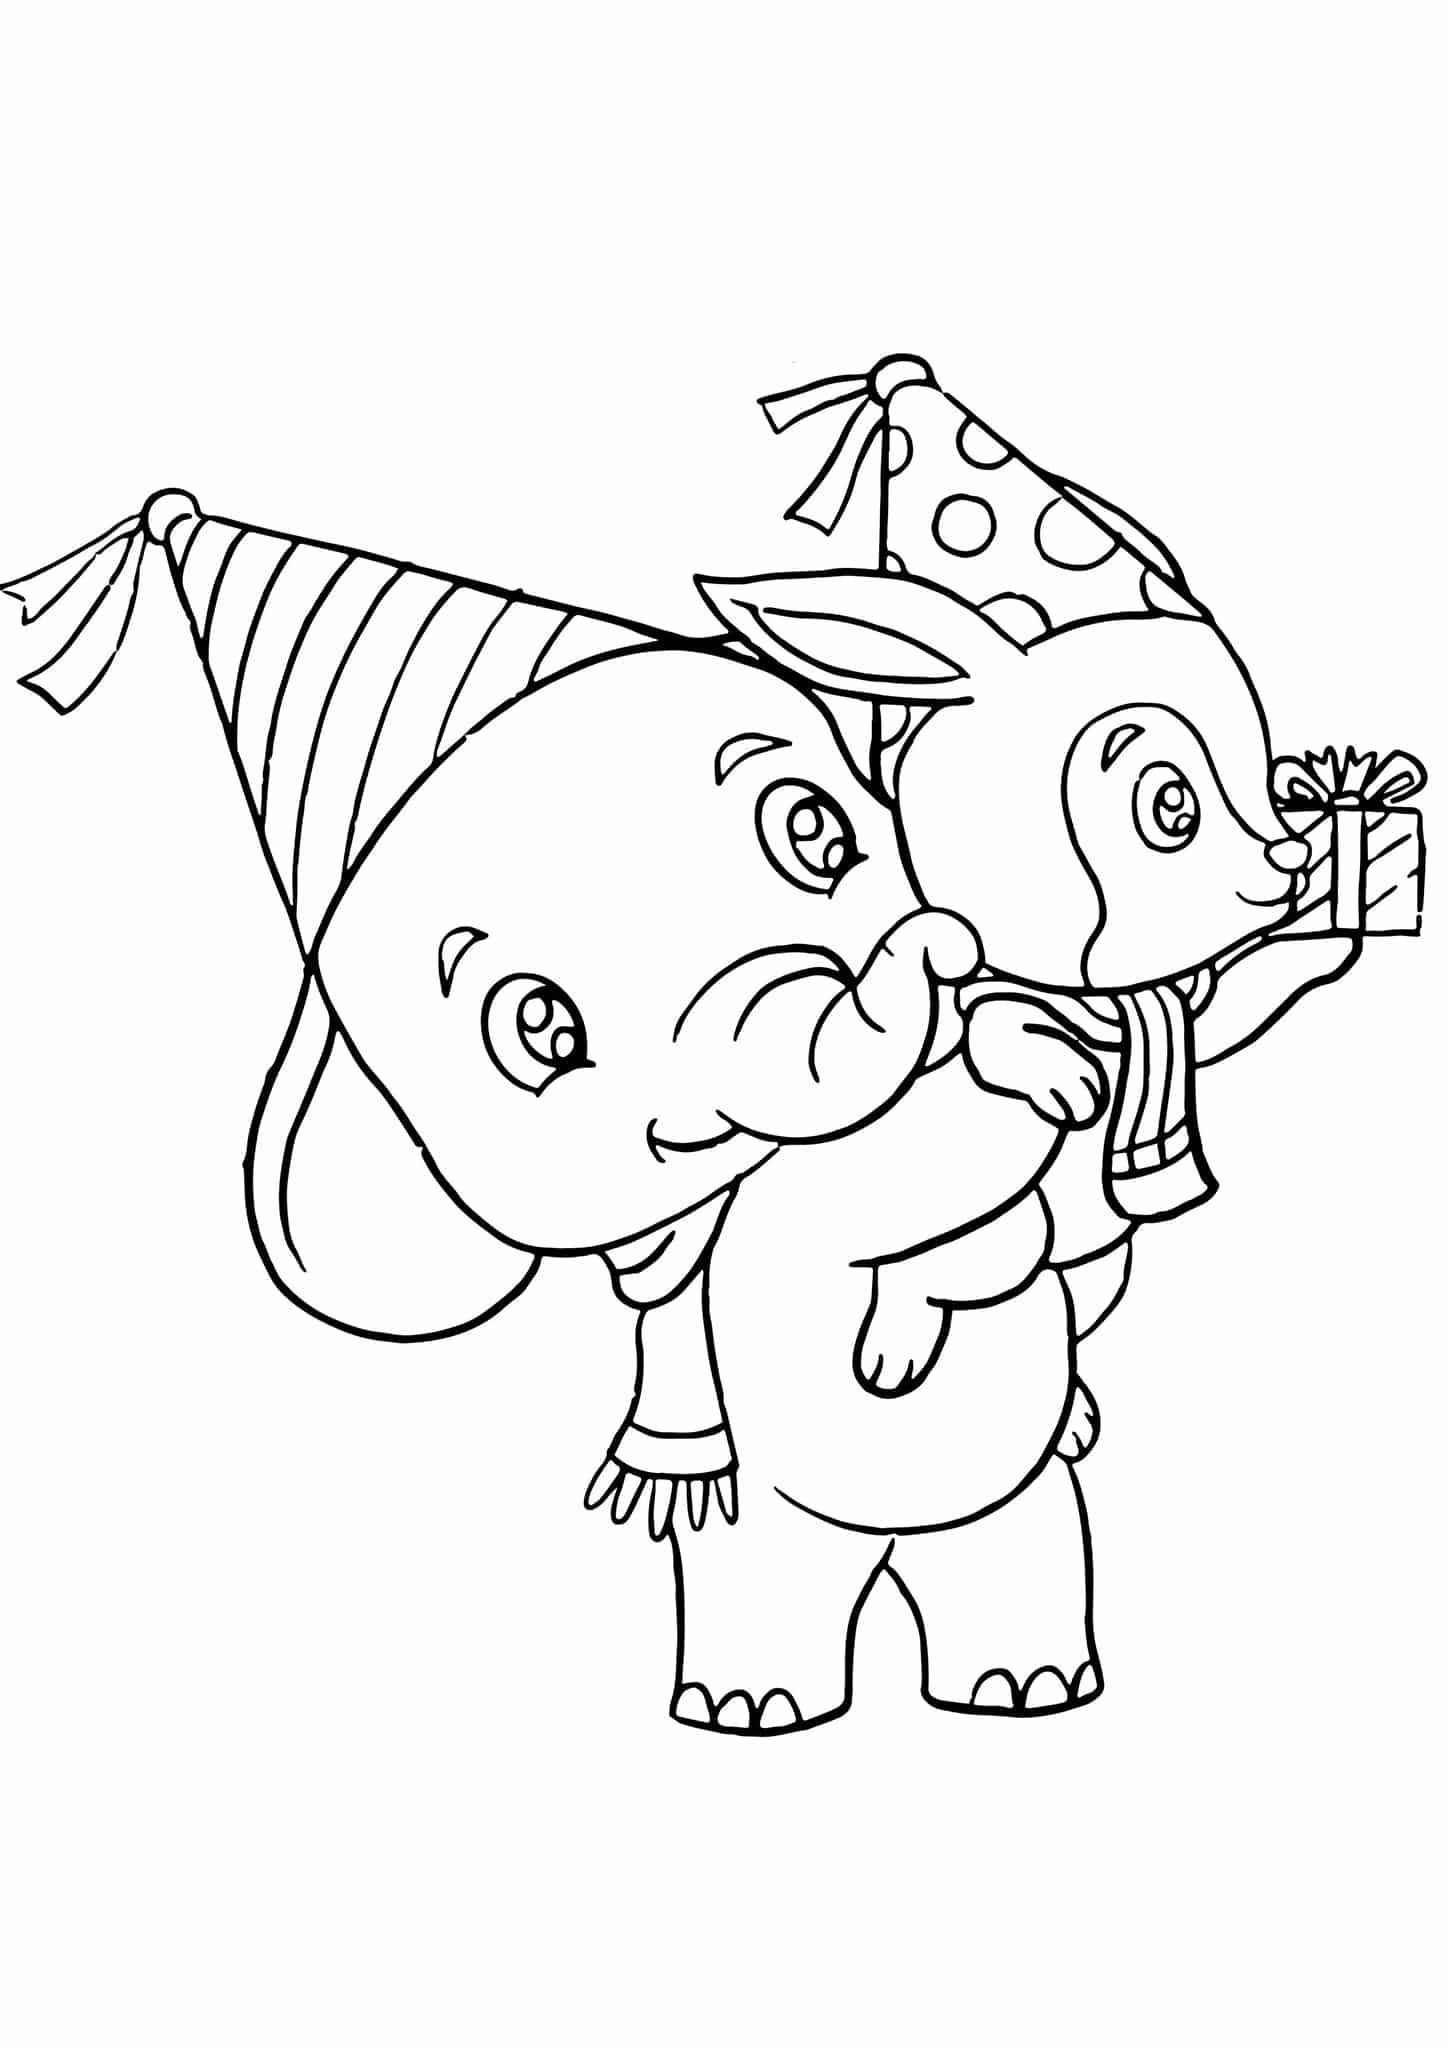 Coloor Elephant Worksheet Printable Worksheets And Activities For Teachers Parents Tutors And Homeschool Families